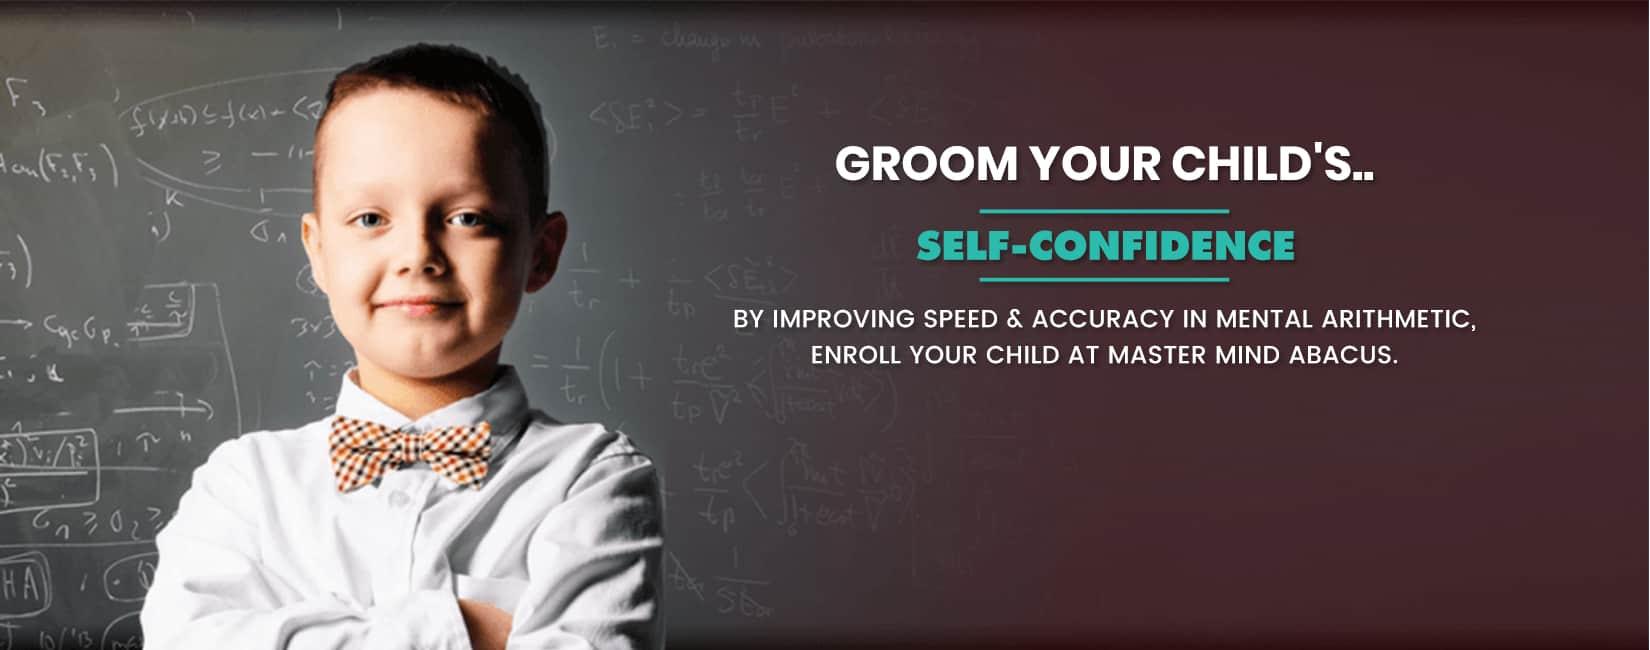 Mastermind-Self-Confidence